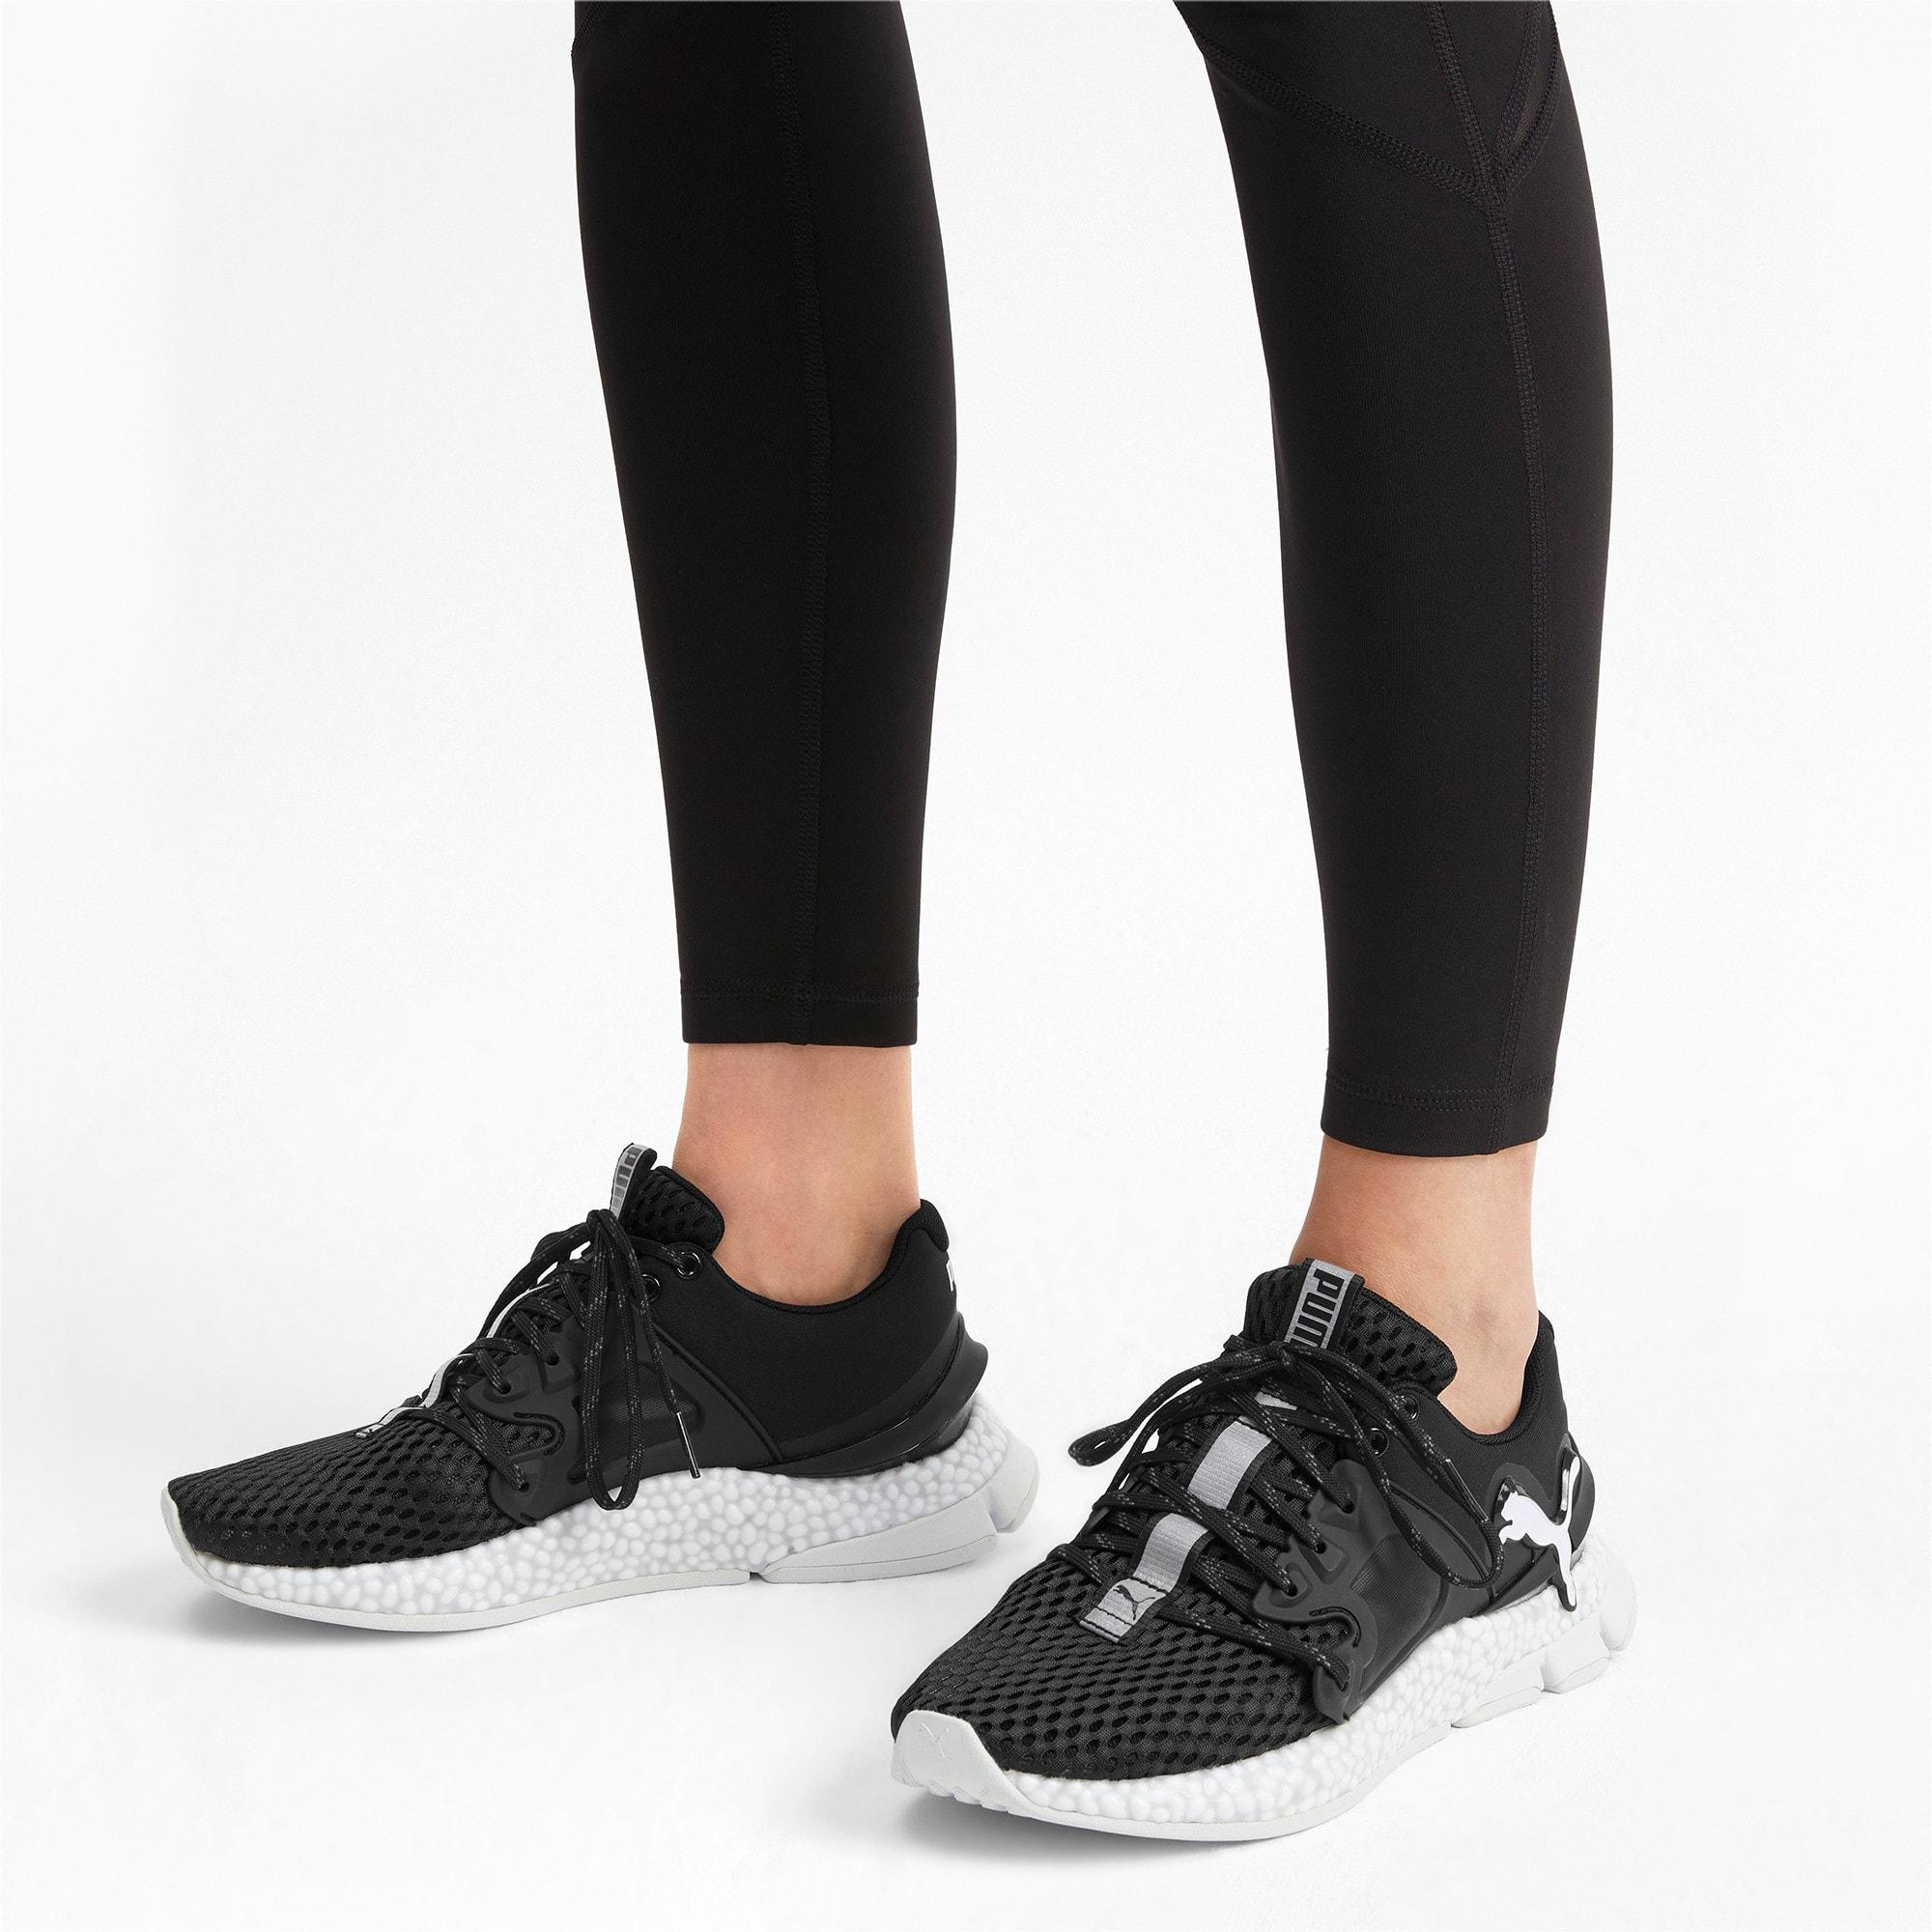 Thumbnail 2 of HYBRID Sky Women's Running Shoes, Puma Black-Puma White, medium